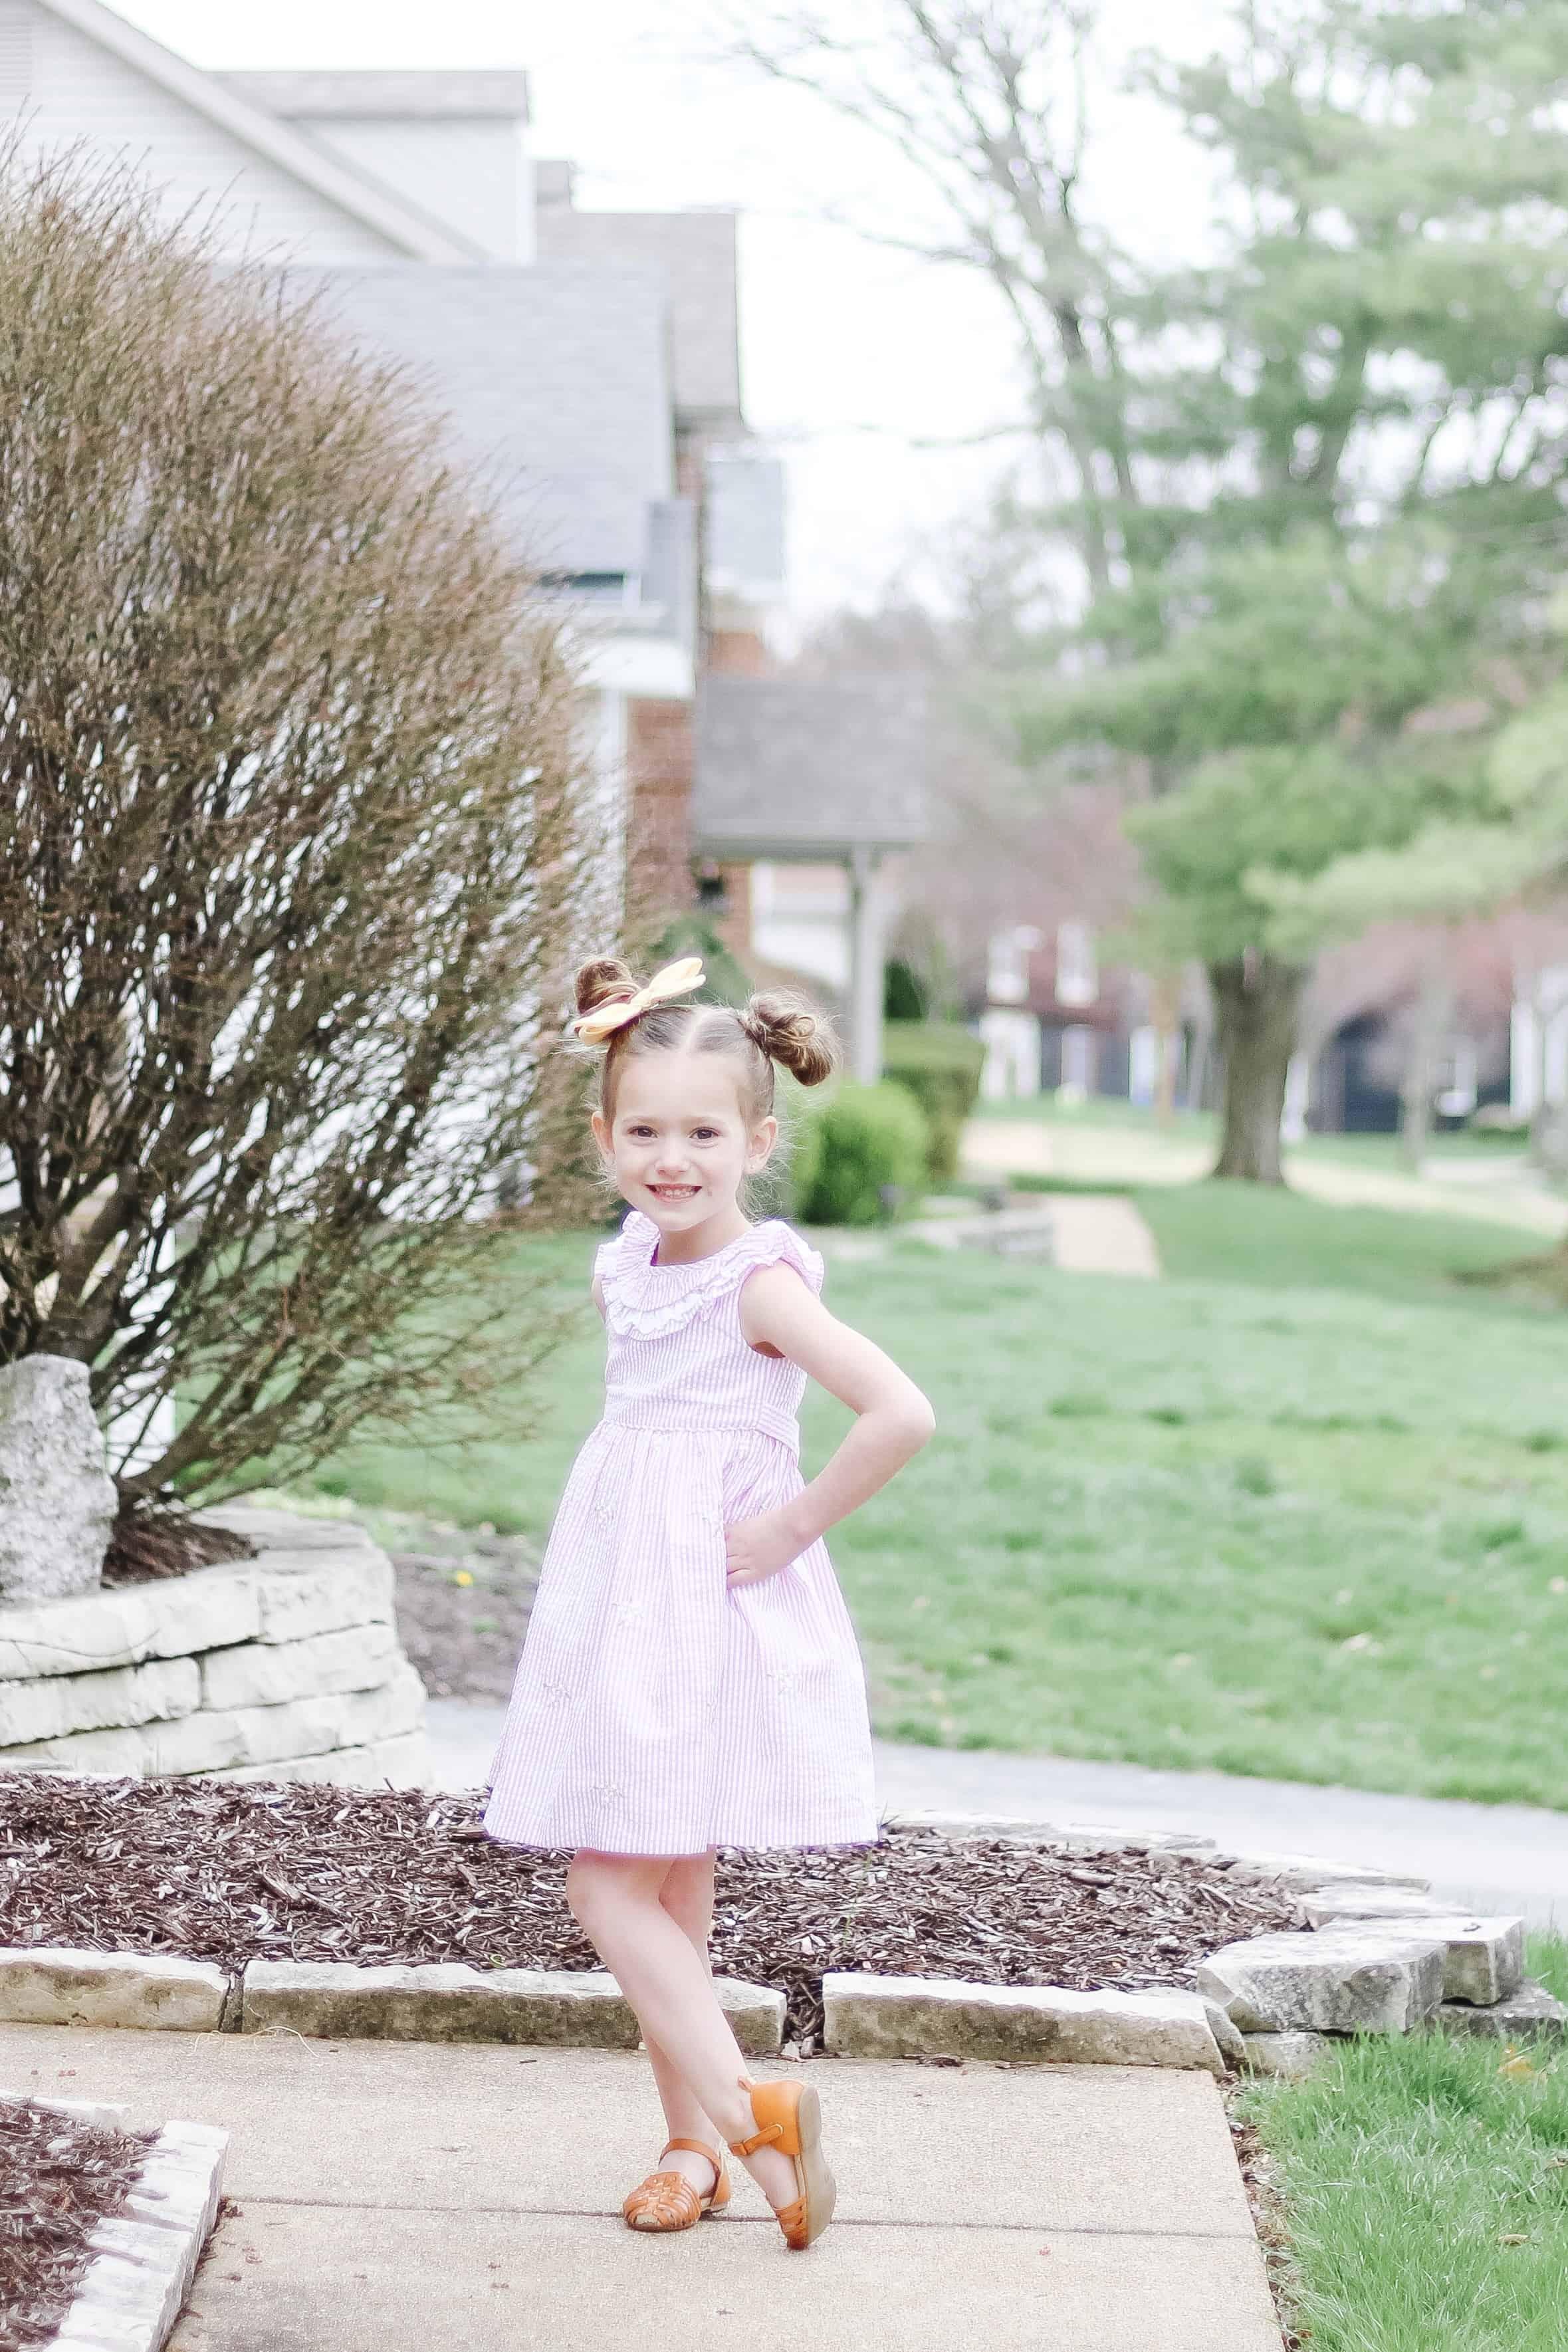 Pink seersucker dress on toddler girl